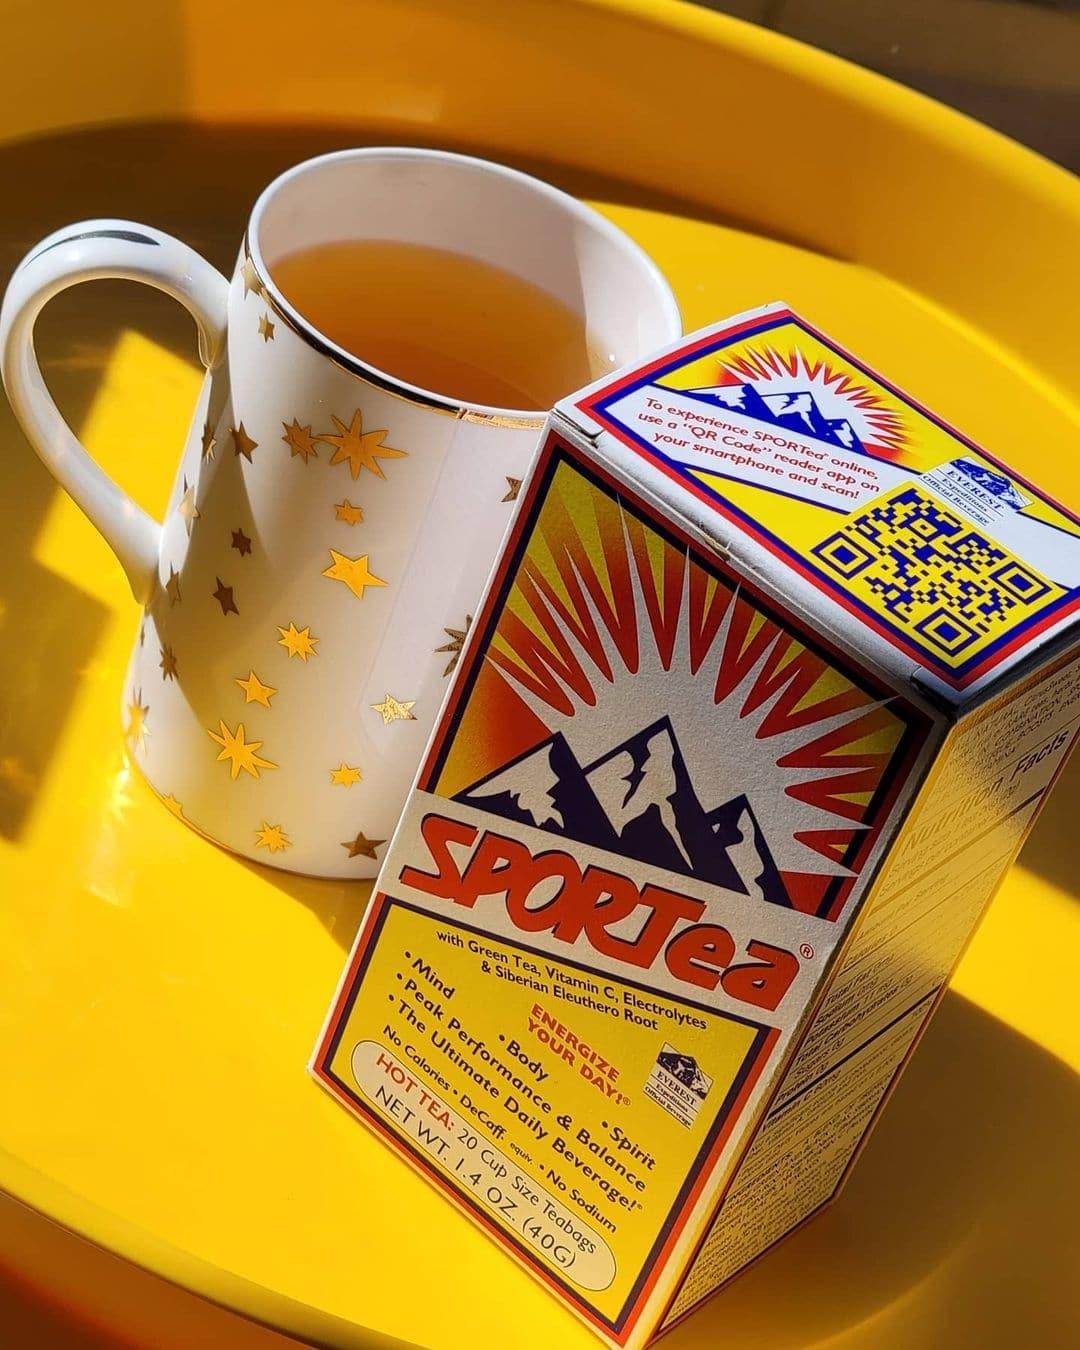 Image of SPORTea in a mug